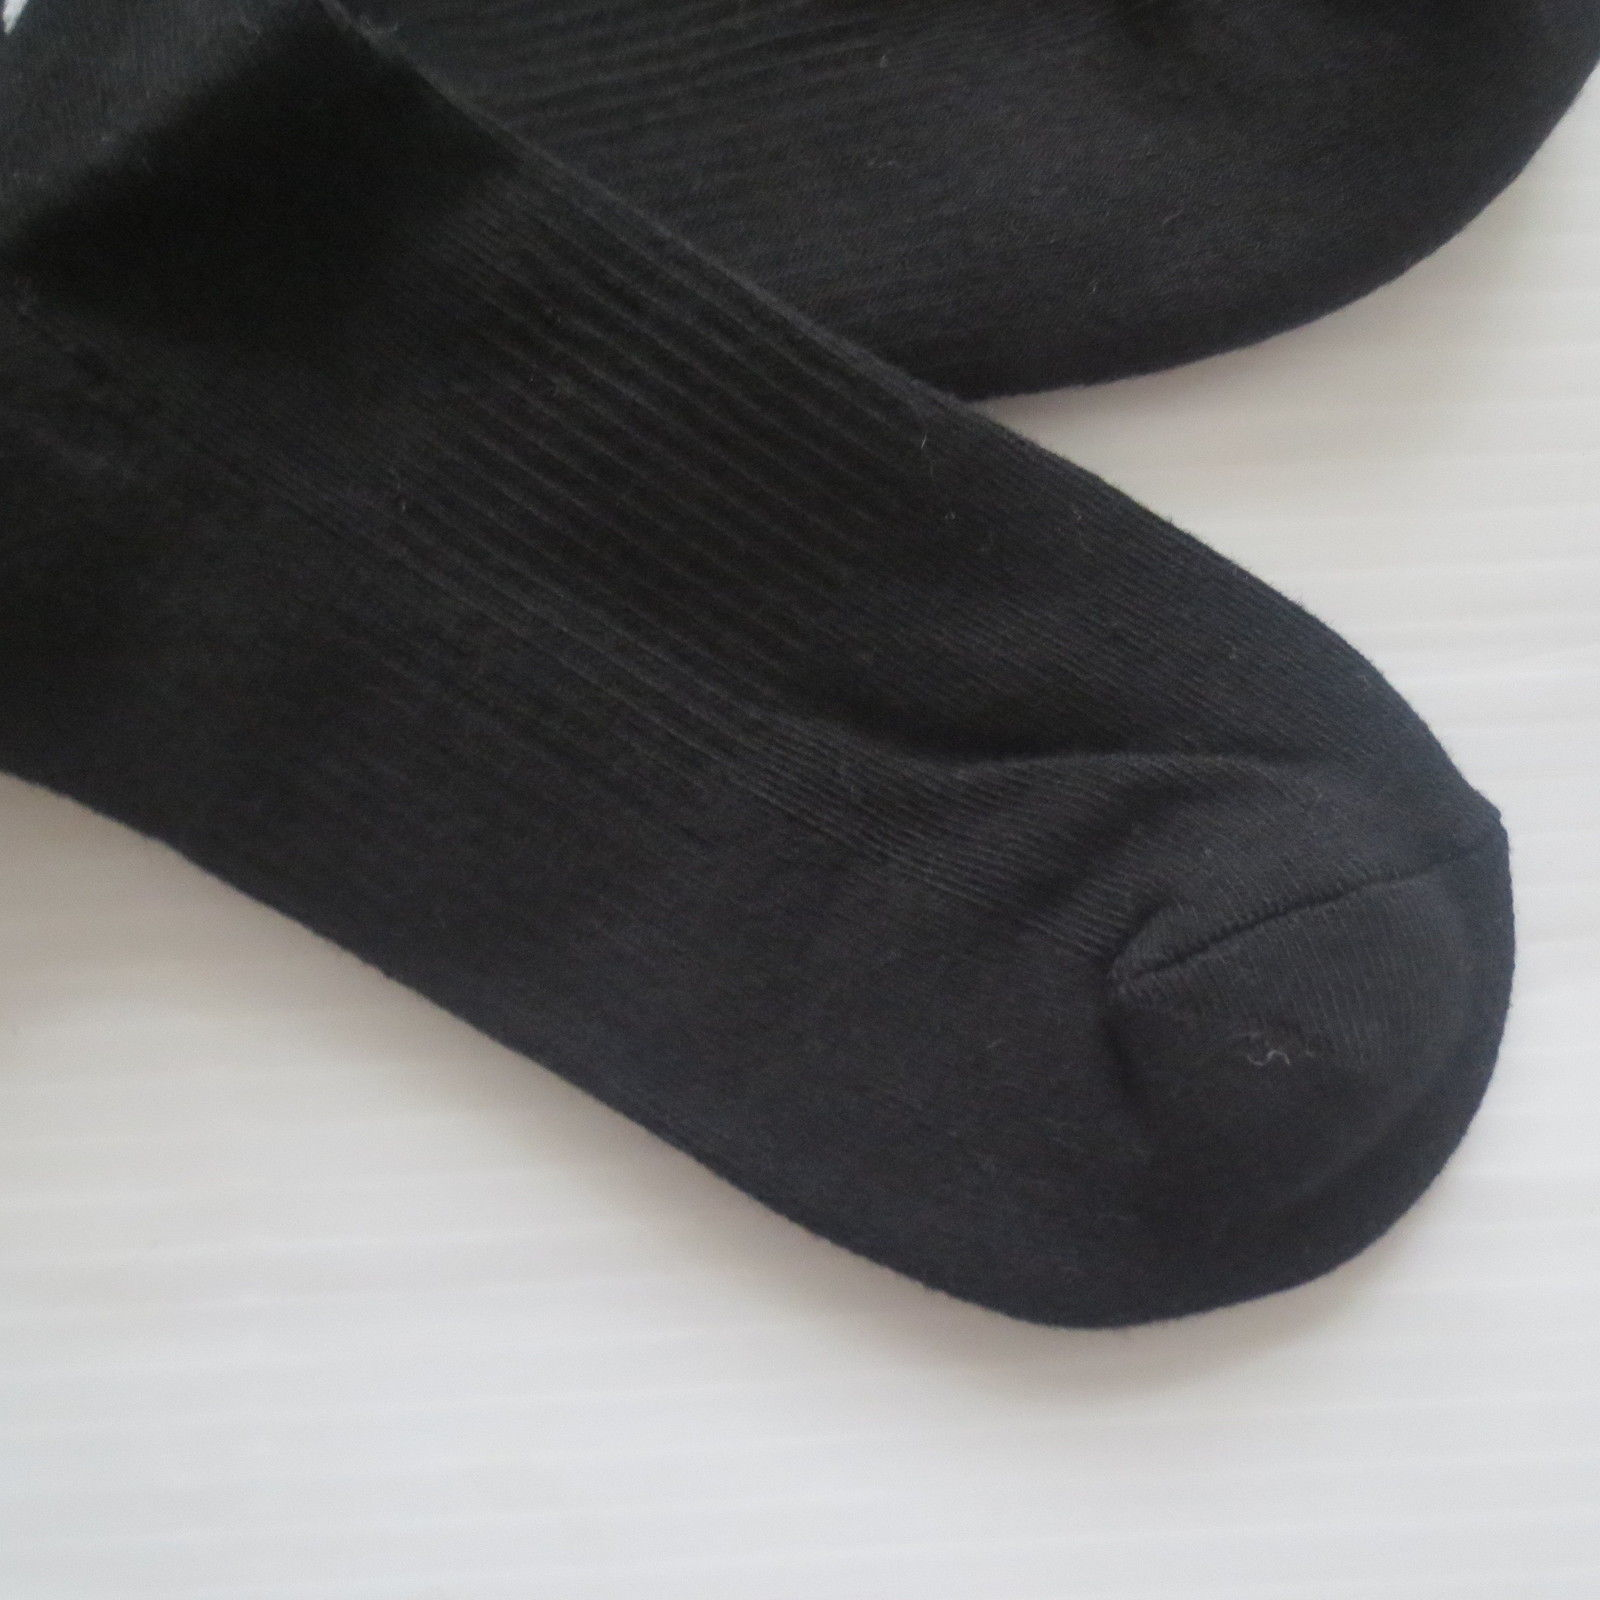 Nike Youth Performance Crew Socks - SX5815 - Black Stripe - Size M - NEW